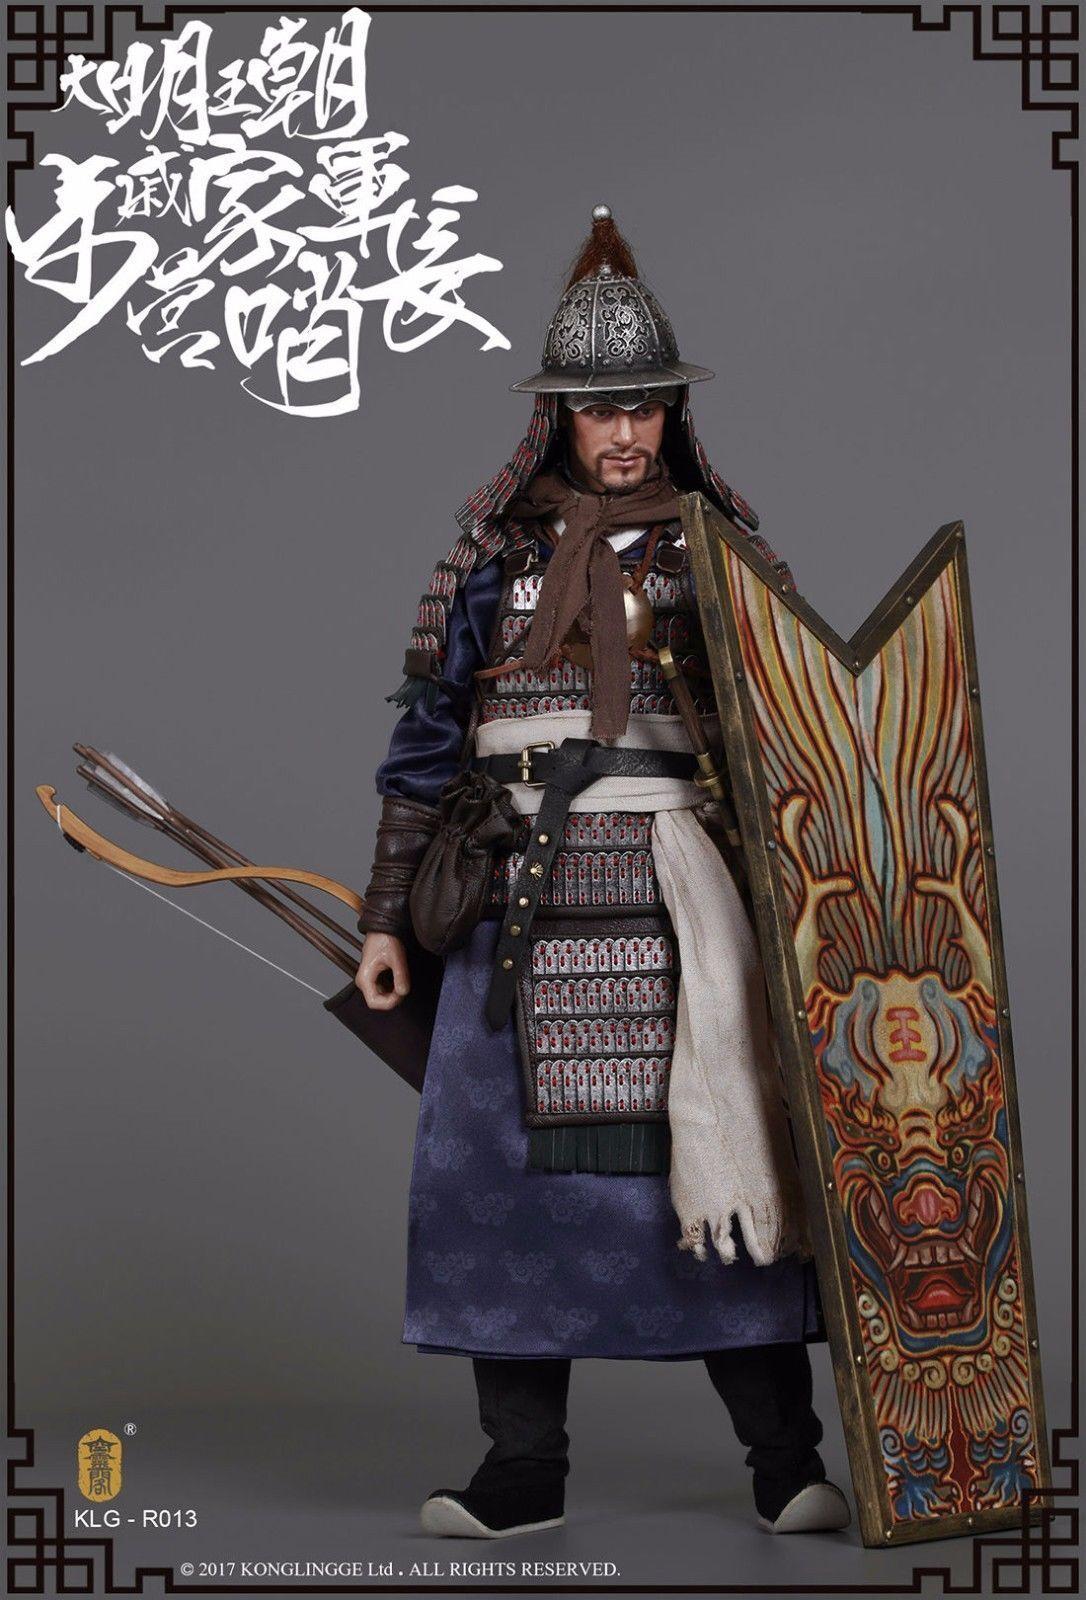 KLG-R013 1 6  Ming Dynasty Qi Troop -Walk Comuomoder cifra Full Set modellololo giocattolo  consegna gratuita